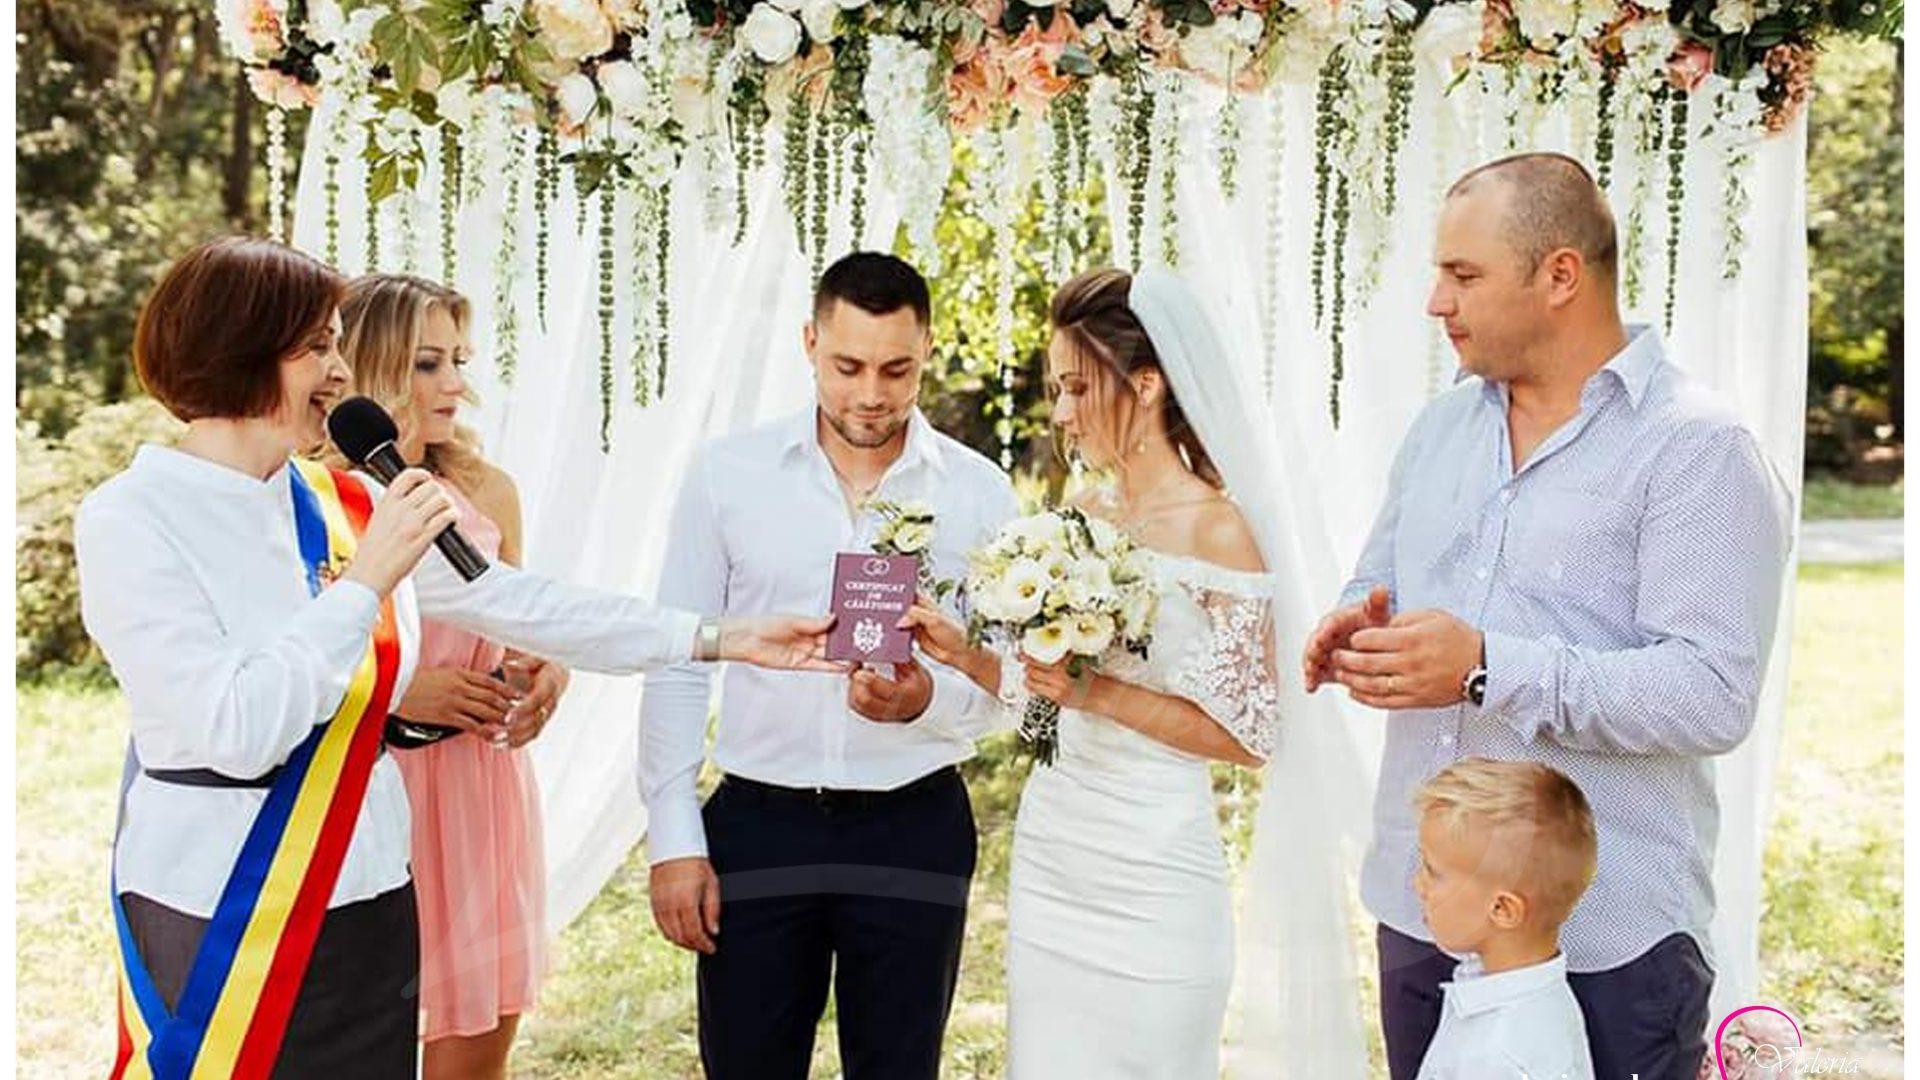 Inregistrarea casatoriei sub cerul liber Agentia Valeria Mariage 069787665 www.valeria (11)